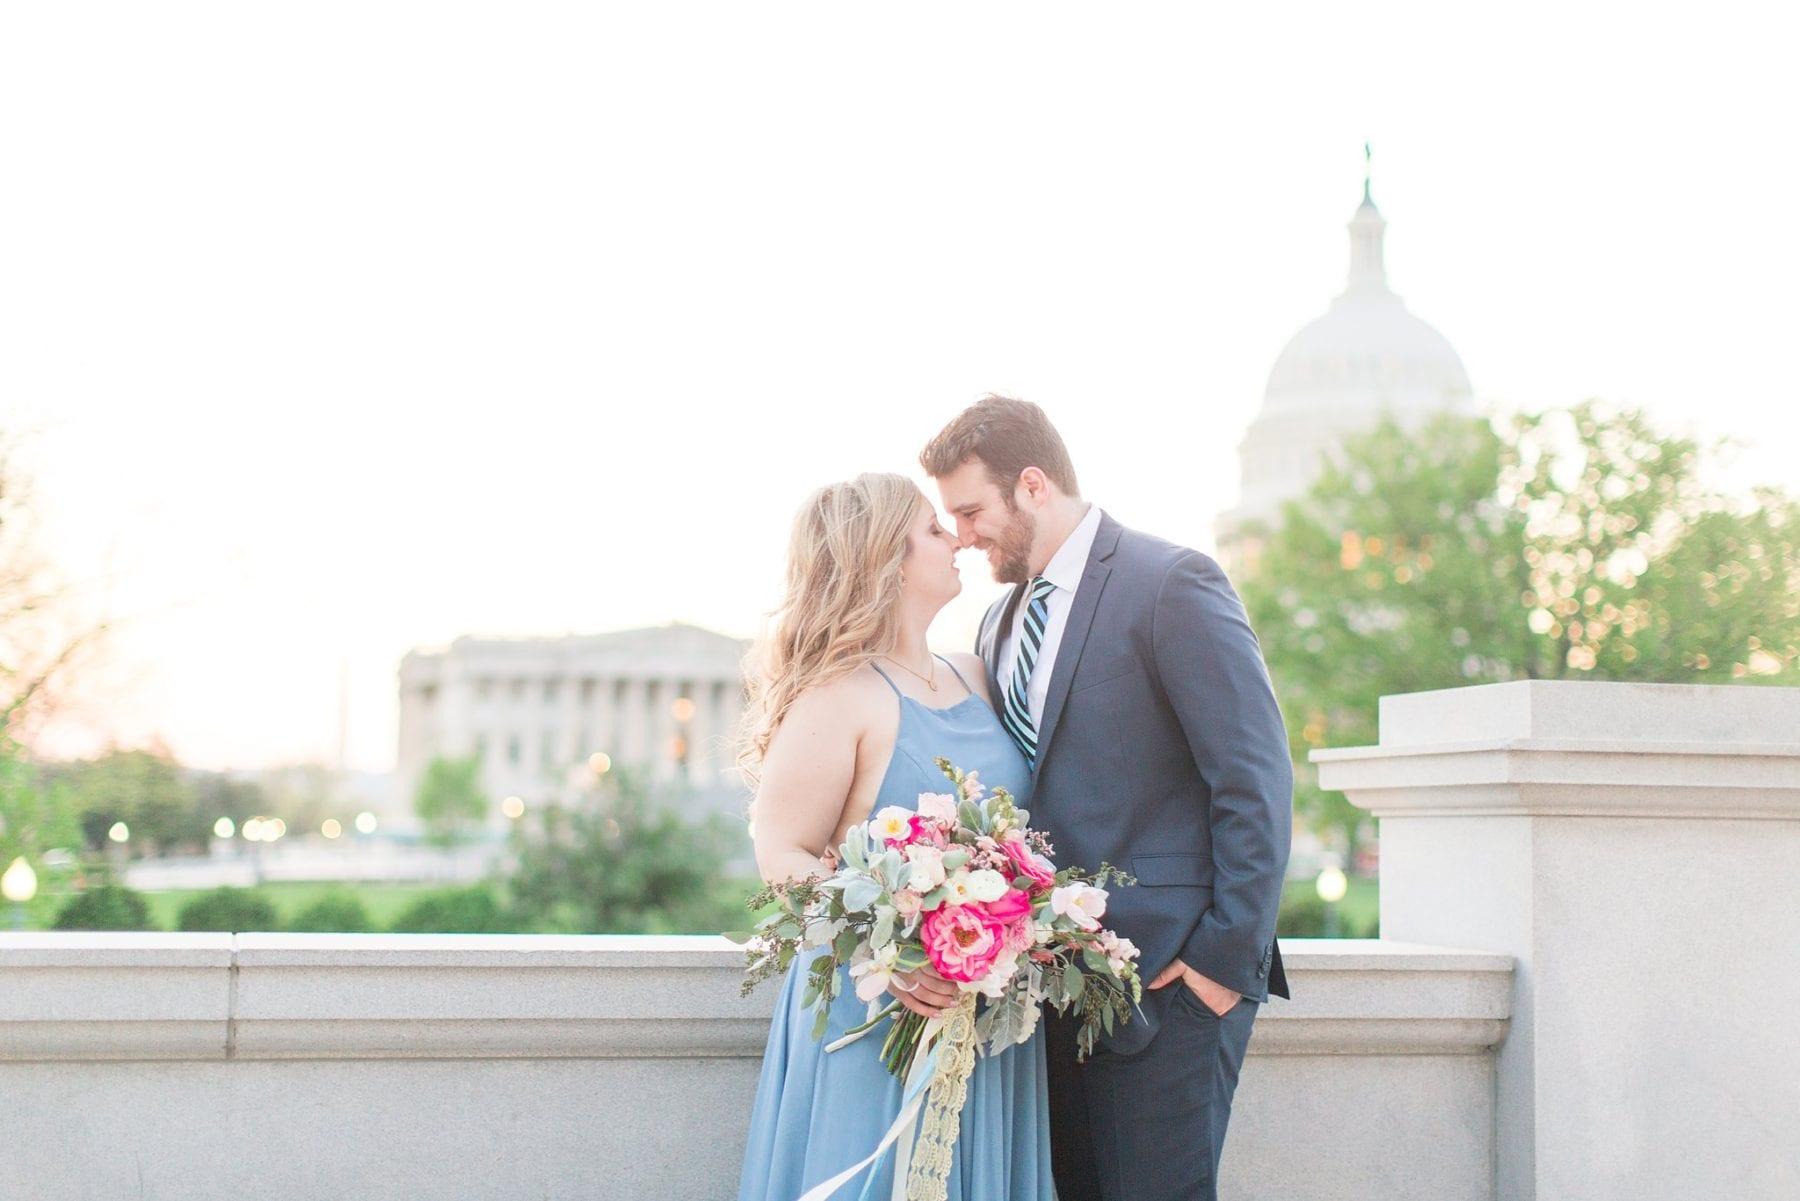 Capitol Hill Engagement Photos Kelly & Zach Washington DC Wedding Photographer Megan Kelsey Photography-365.jpg